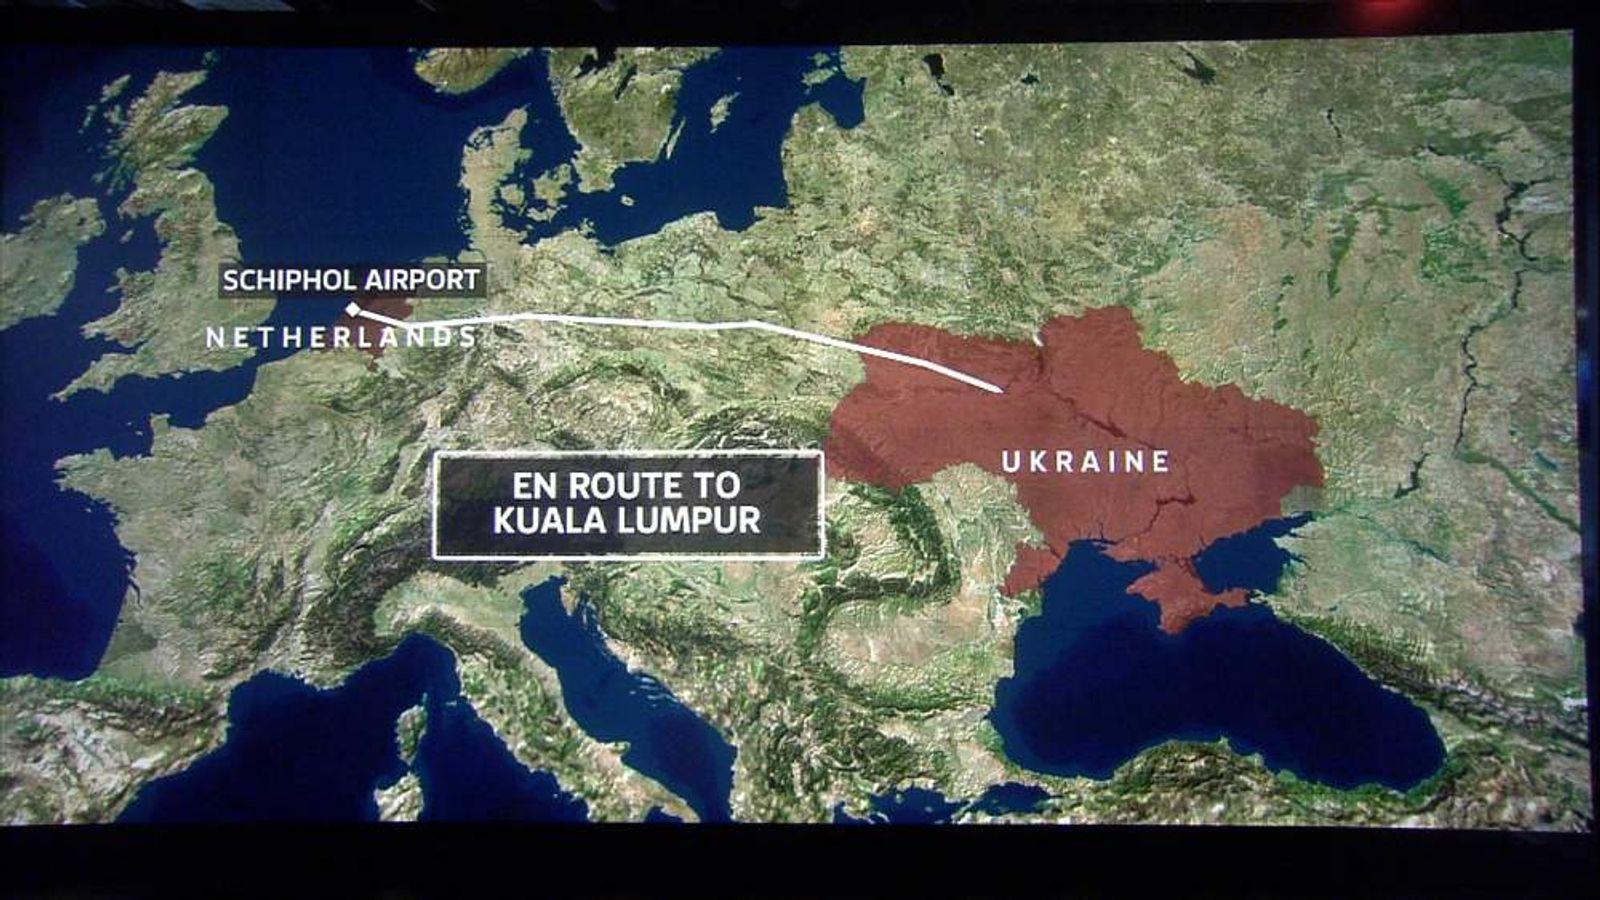 170714 UKRAINE PLANE Newswall 1900 screengrab